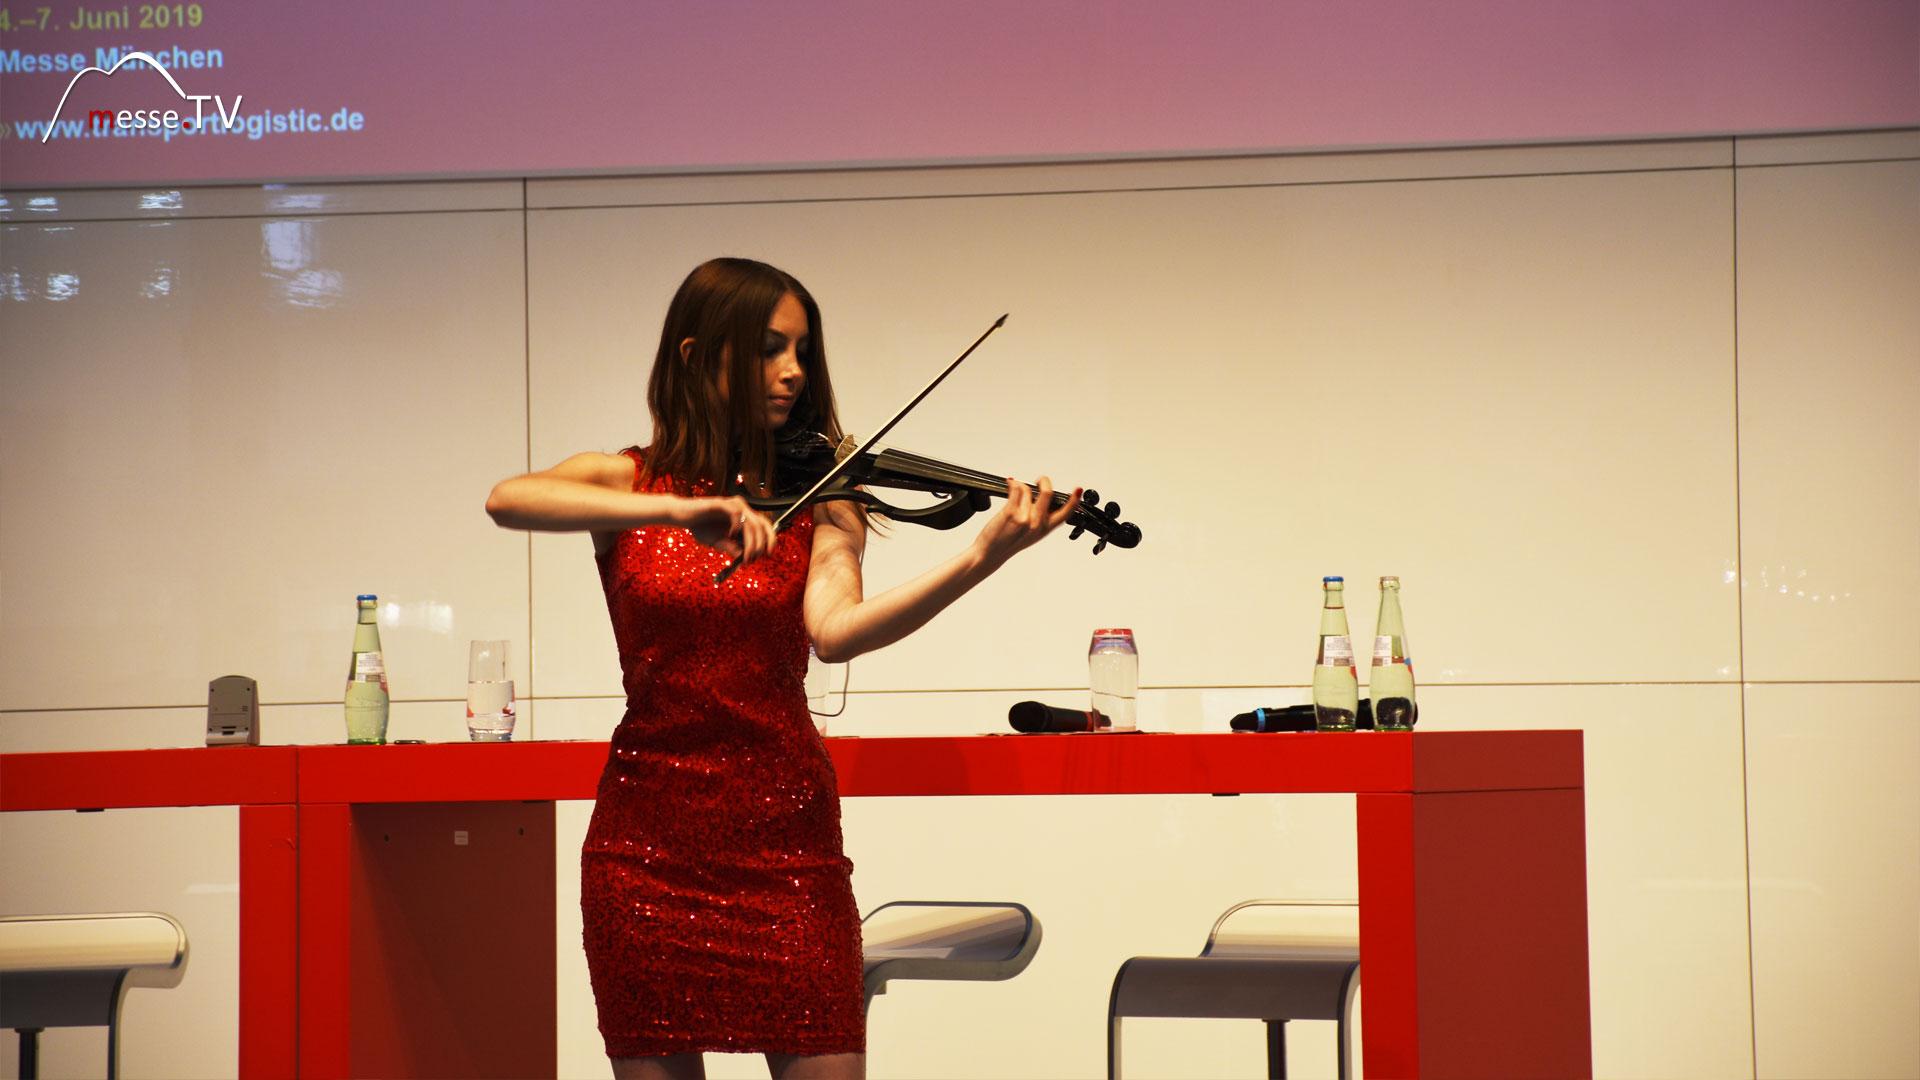 Eröfffnung transport logistic e-Violine